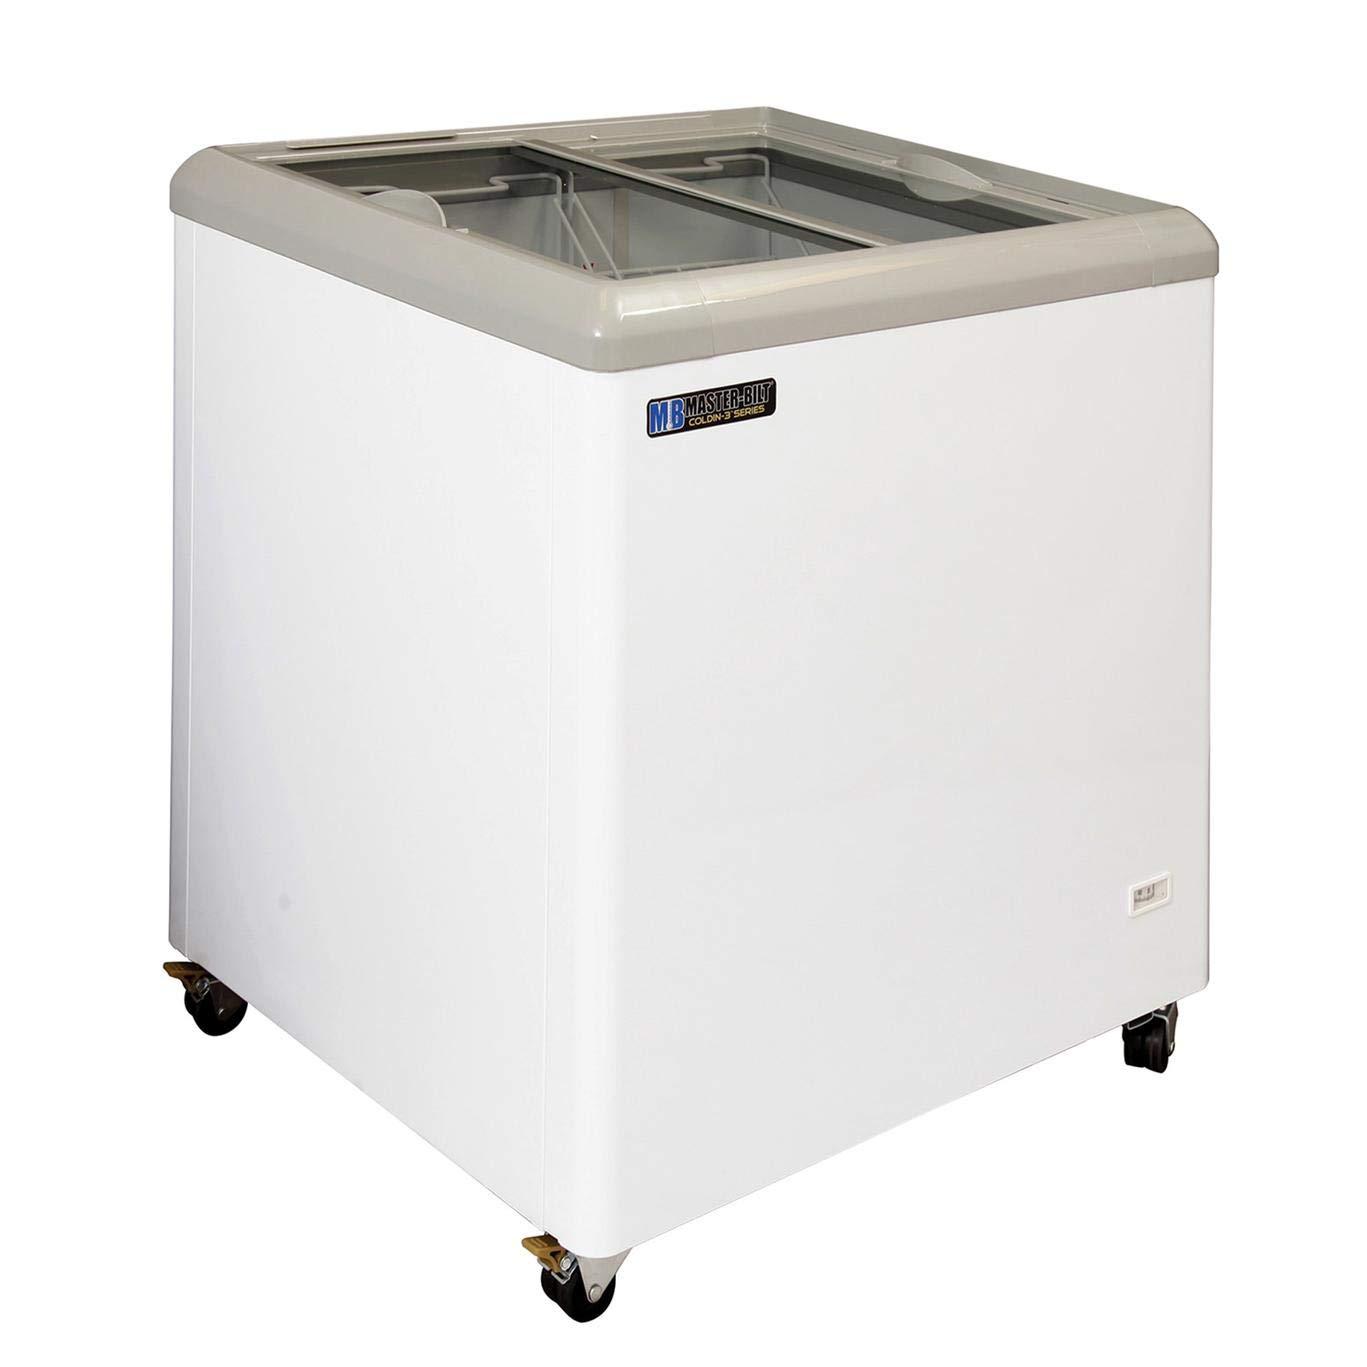 "COLDIN-3 7.5 Cubic Ft Flat Glass Display Freezer 31"" W"